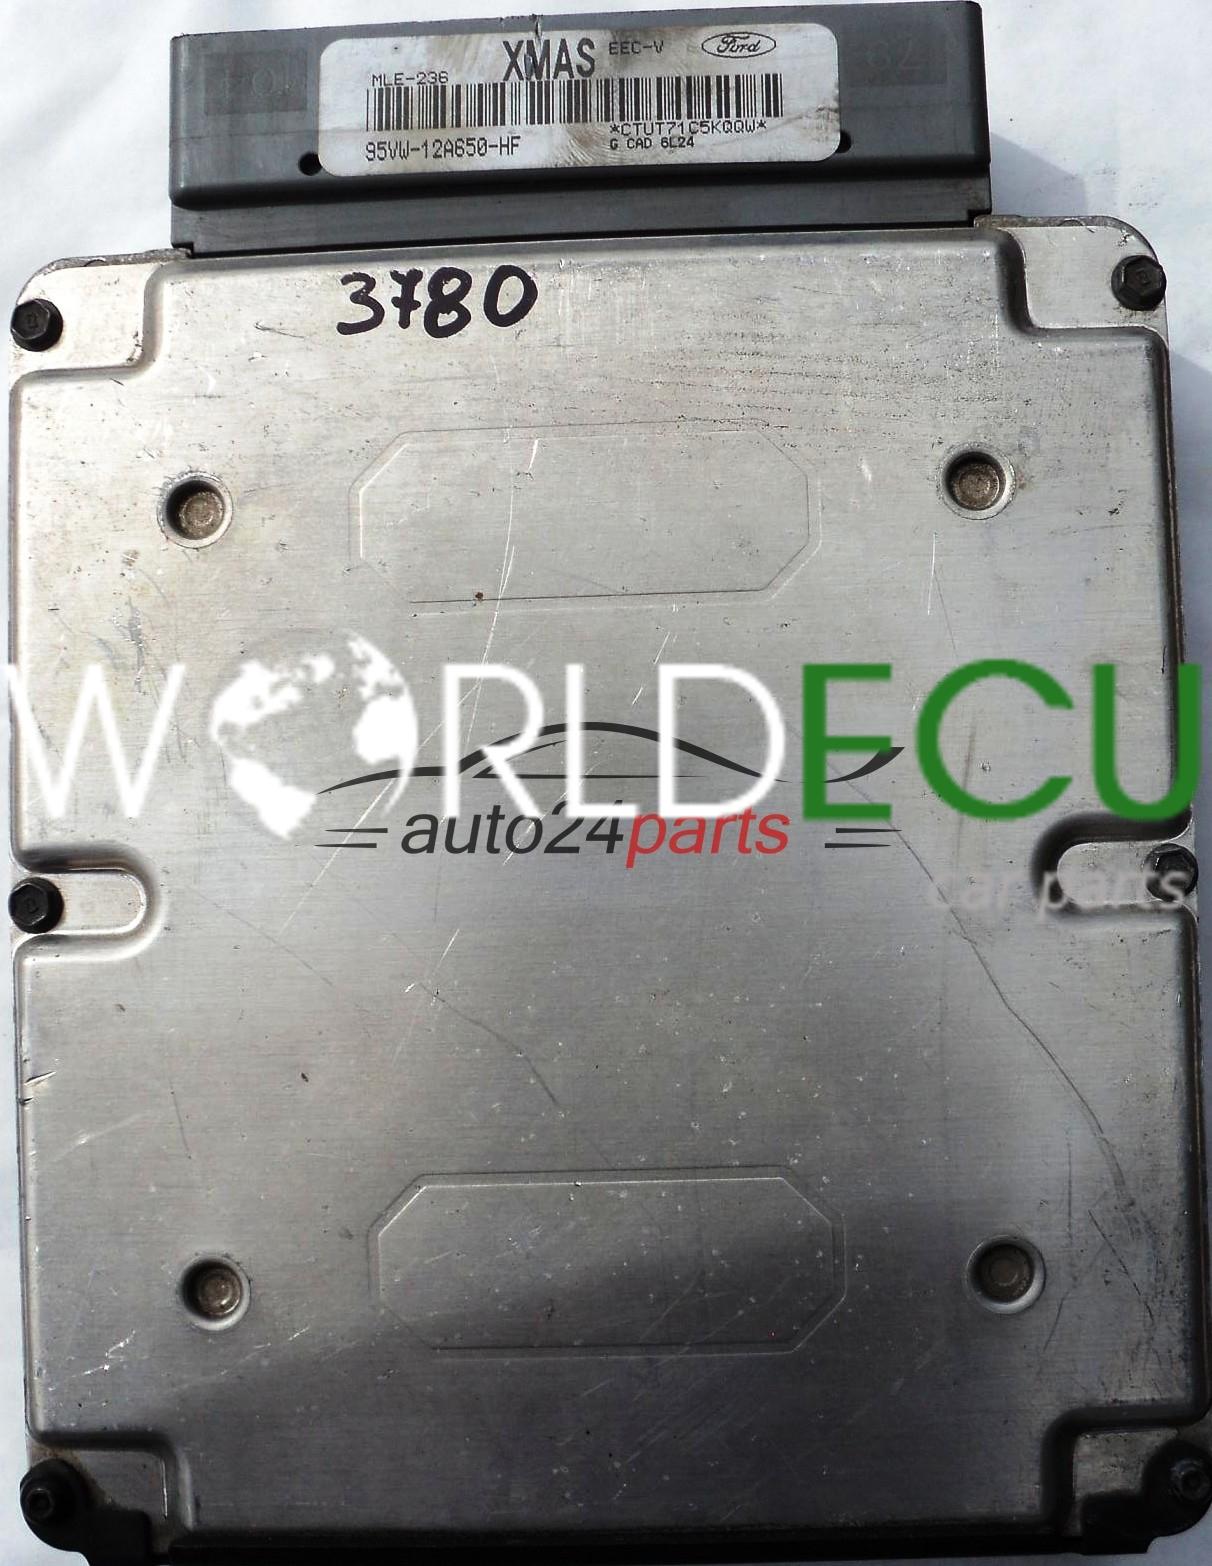 calculateur moteur ford galaxy 2 3 95vw12a650hf xmas mle 236 95vw 12a650 hf calculateur. Black Bedroom Furniture Sets. Home Design Ideas